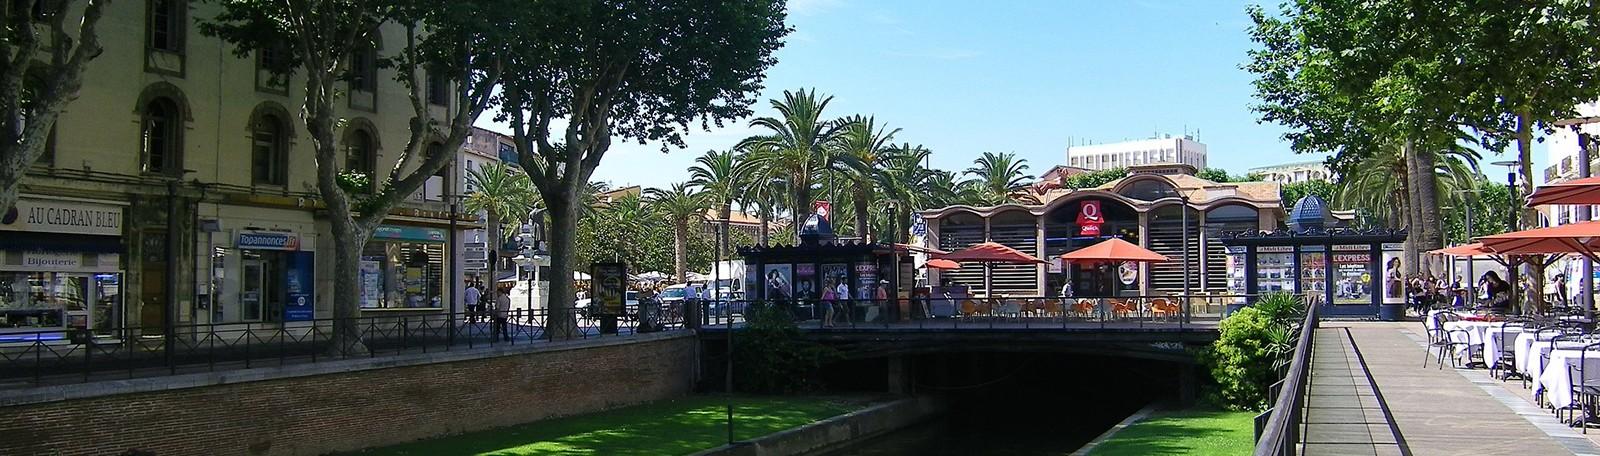 Car park Wilson - Park in Perpignan | Q-Park